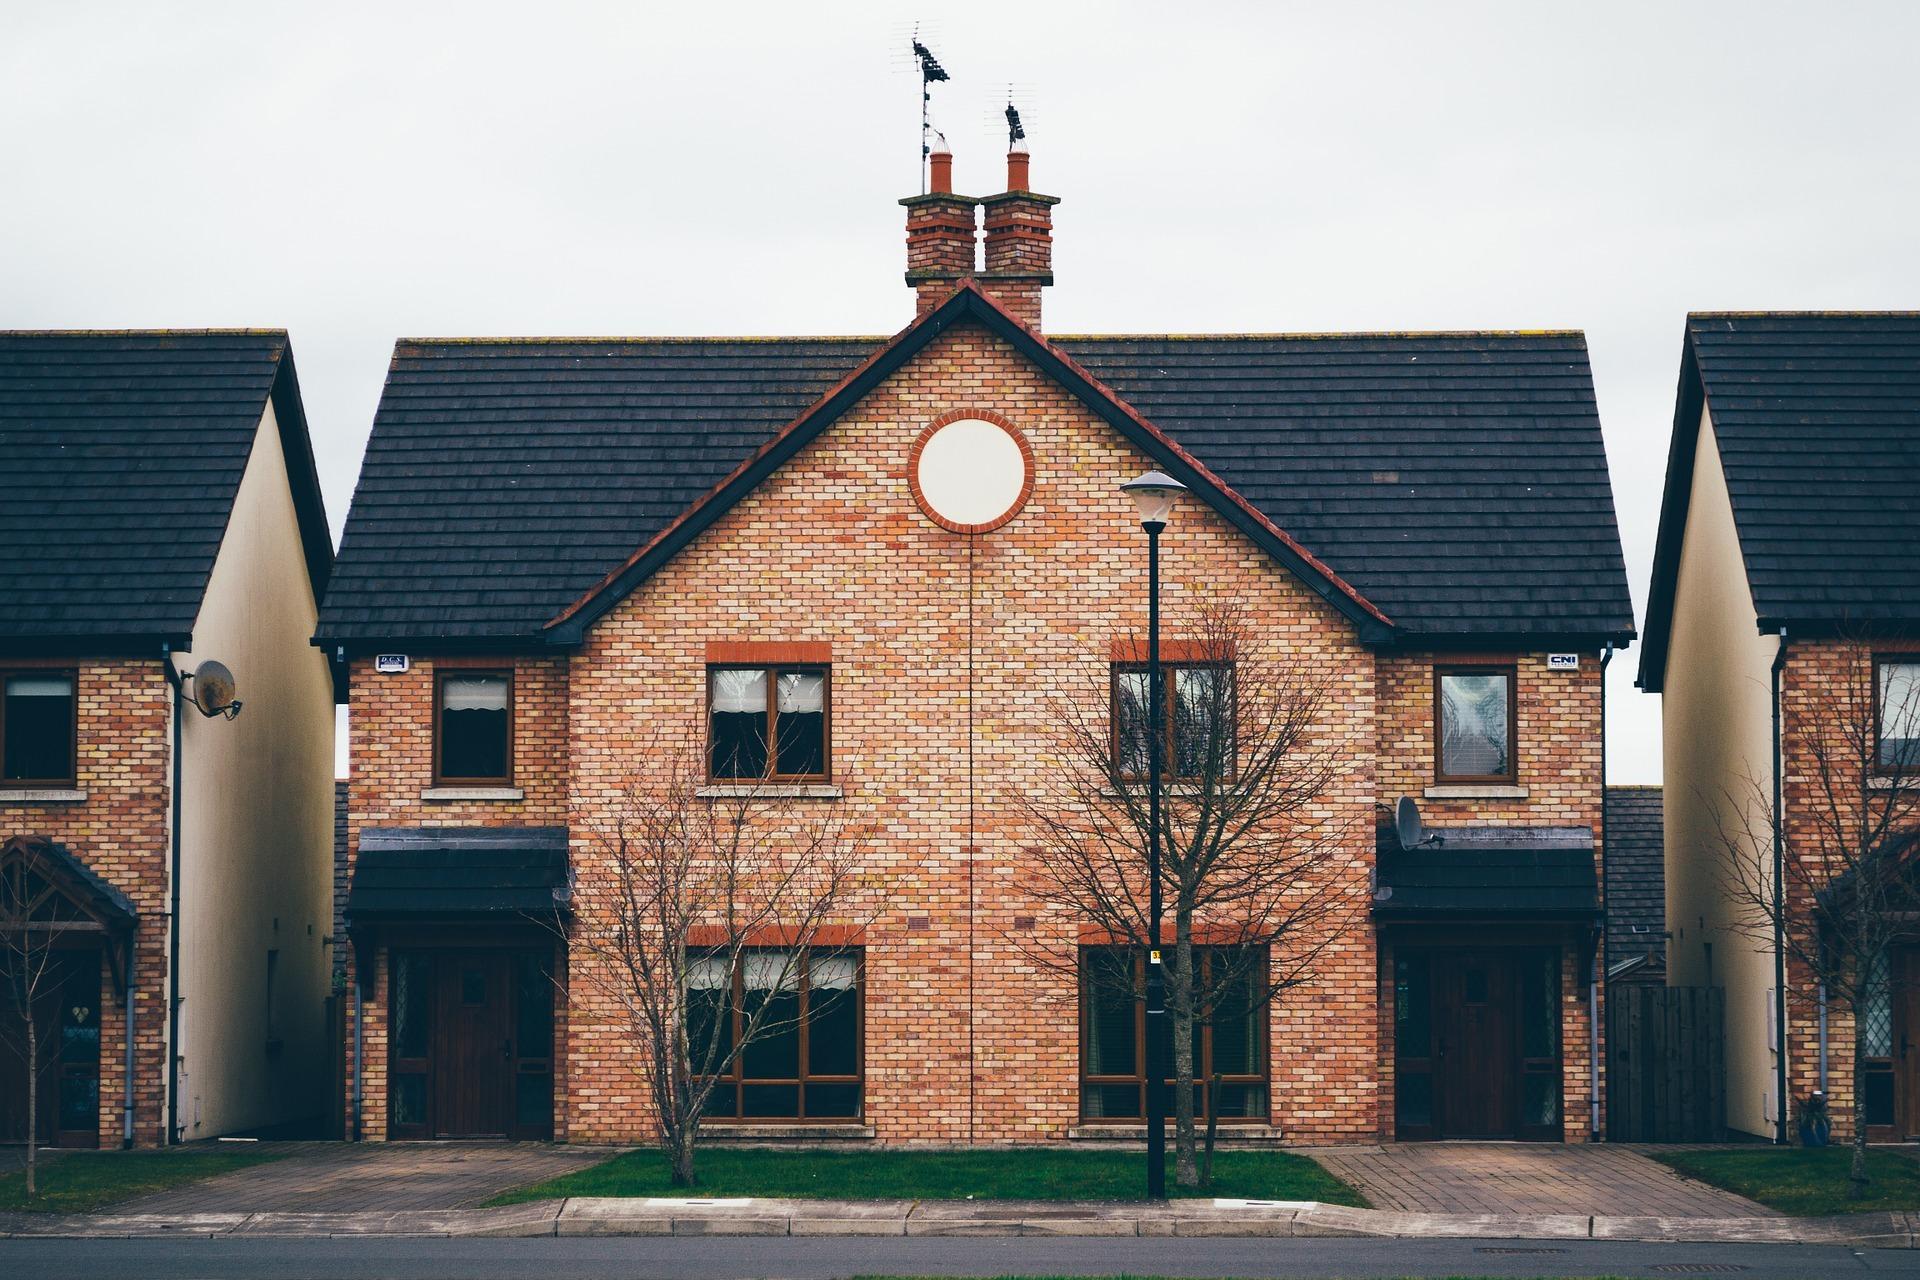 A semi detached house